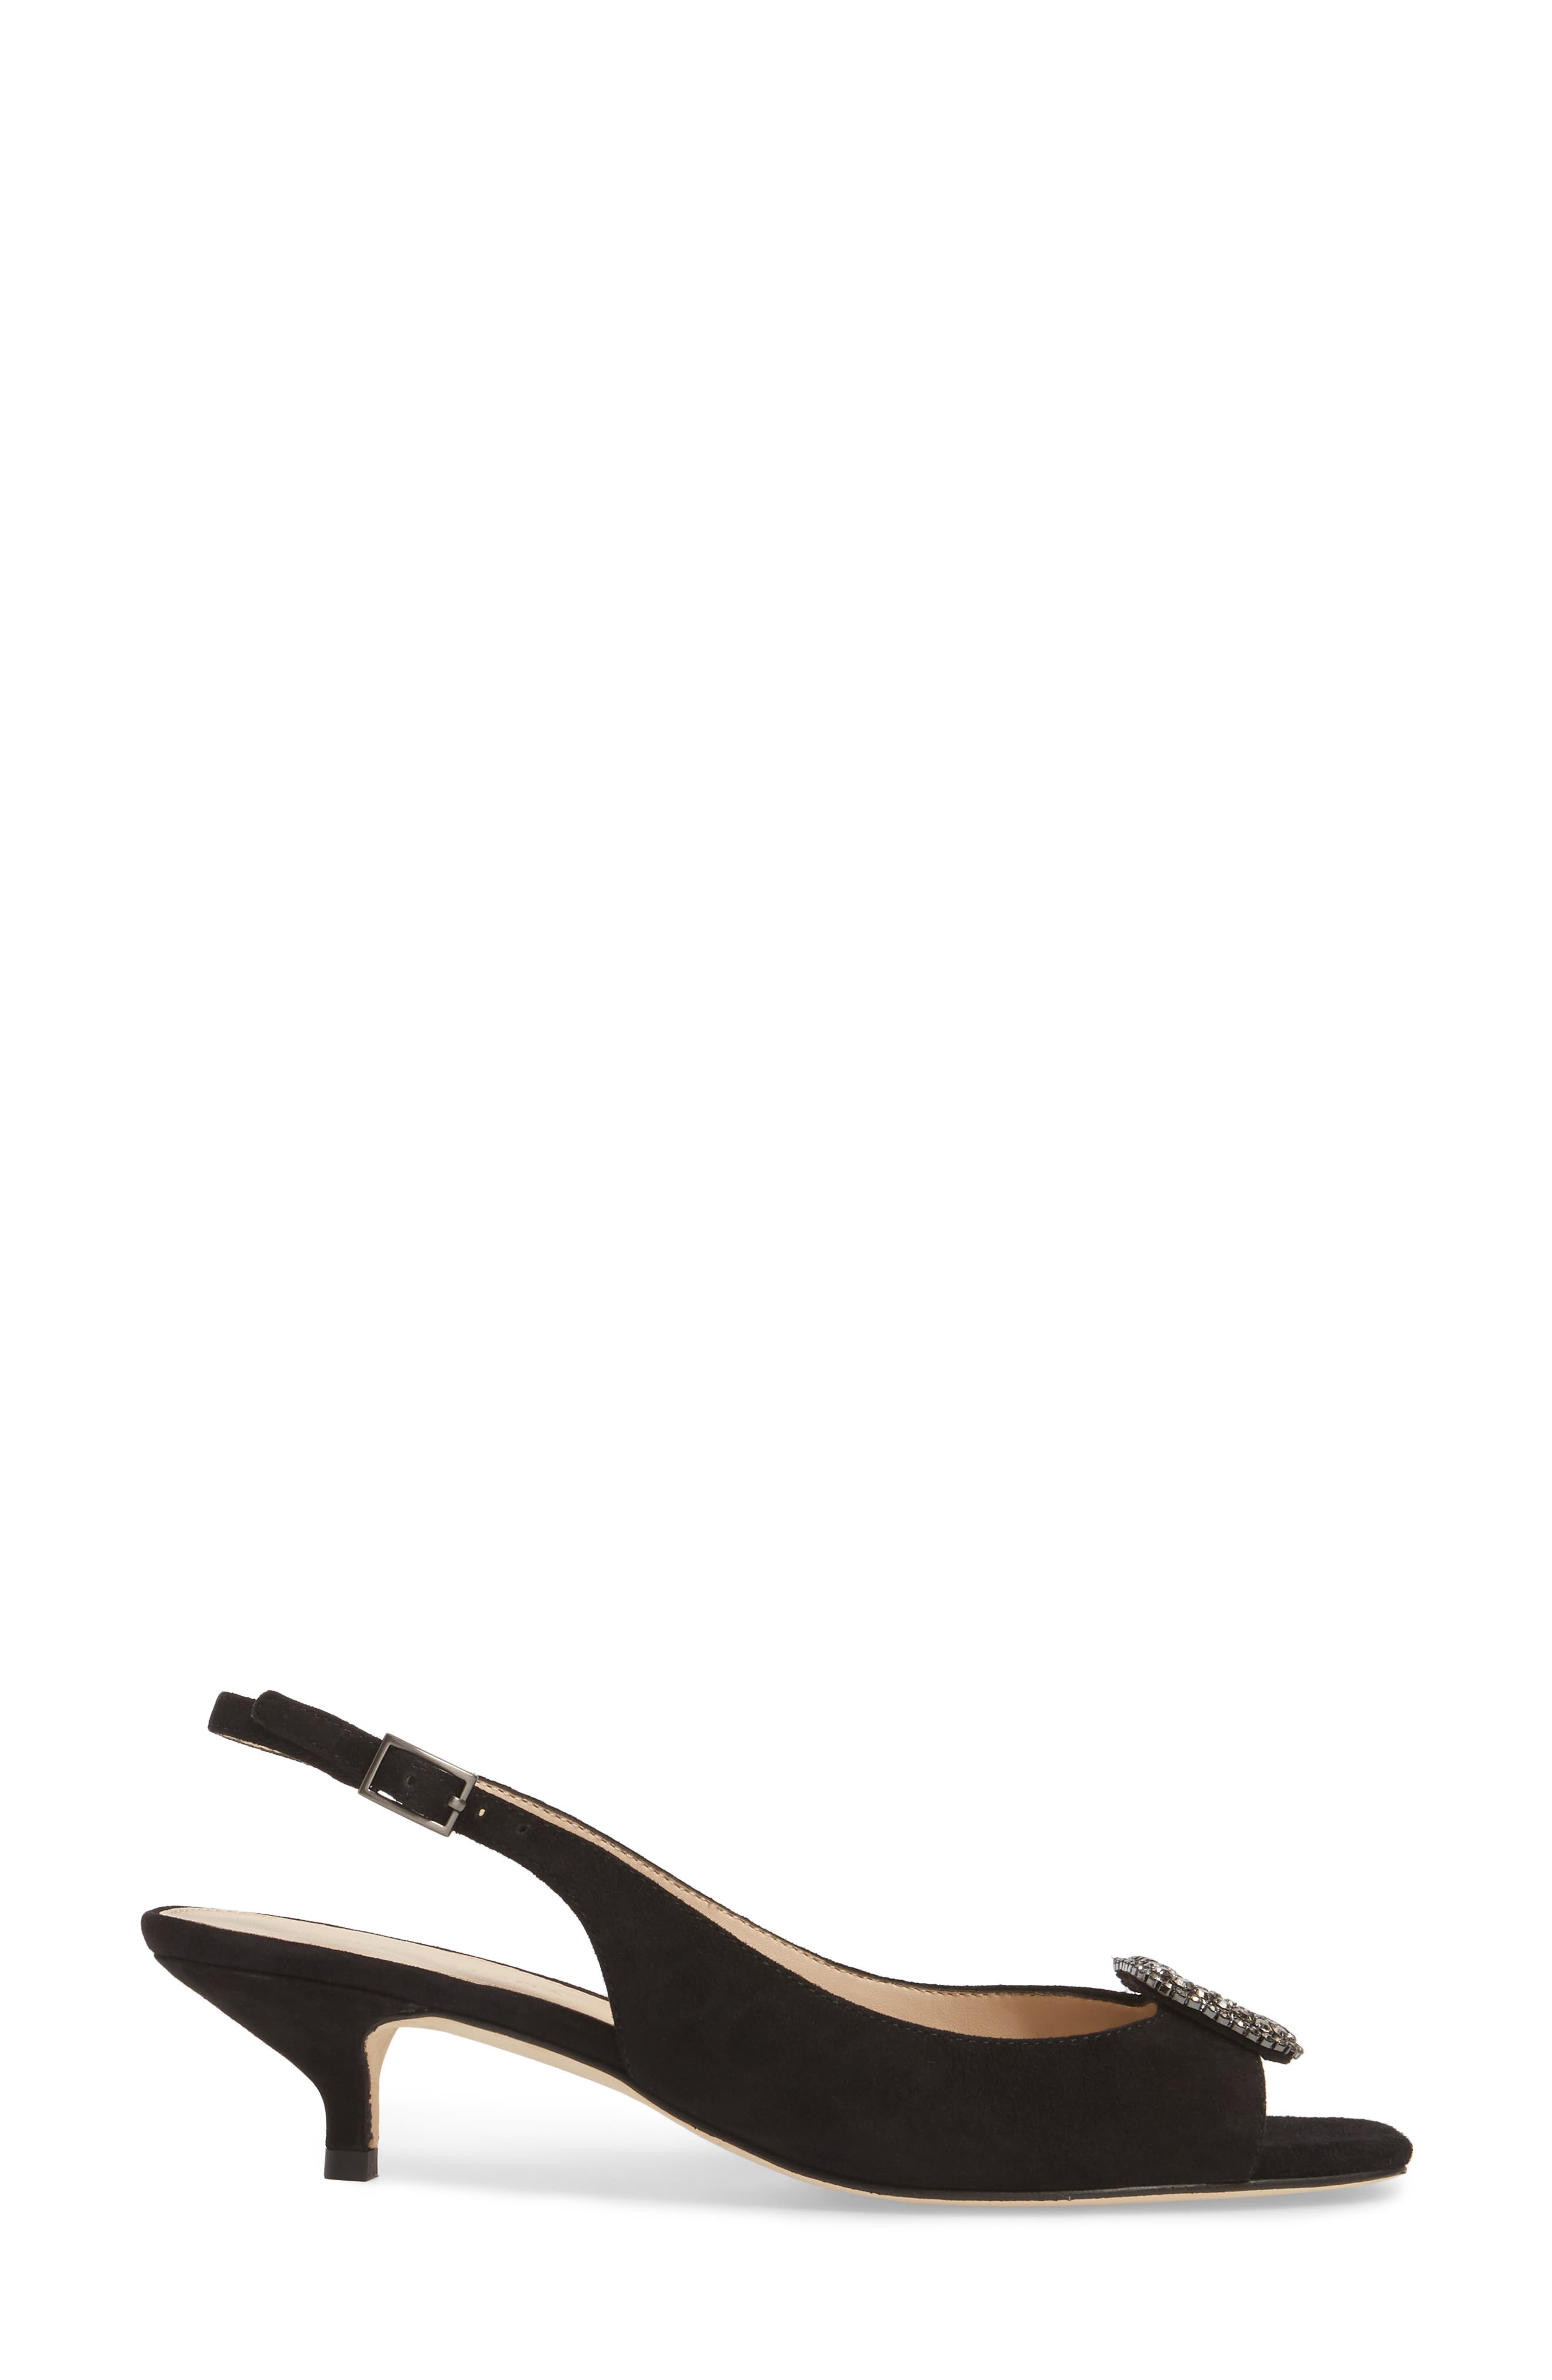 Fresca Slingback Sandal,                             Alternate thumbnail 3, color,                             001